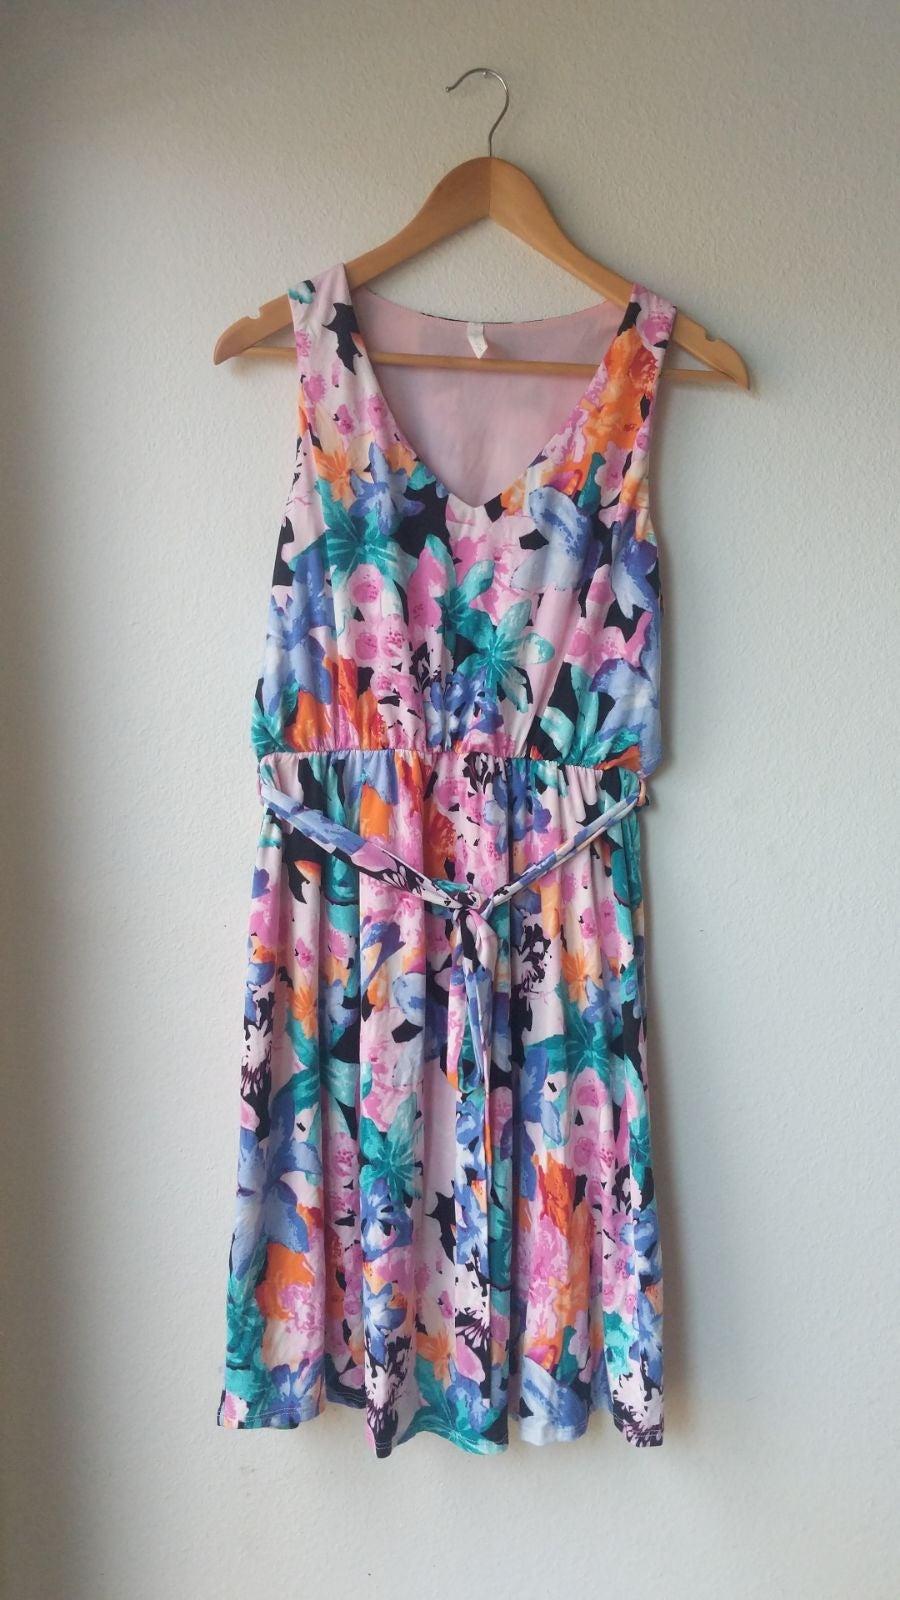 Pinkblush floral summer maternity dress